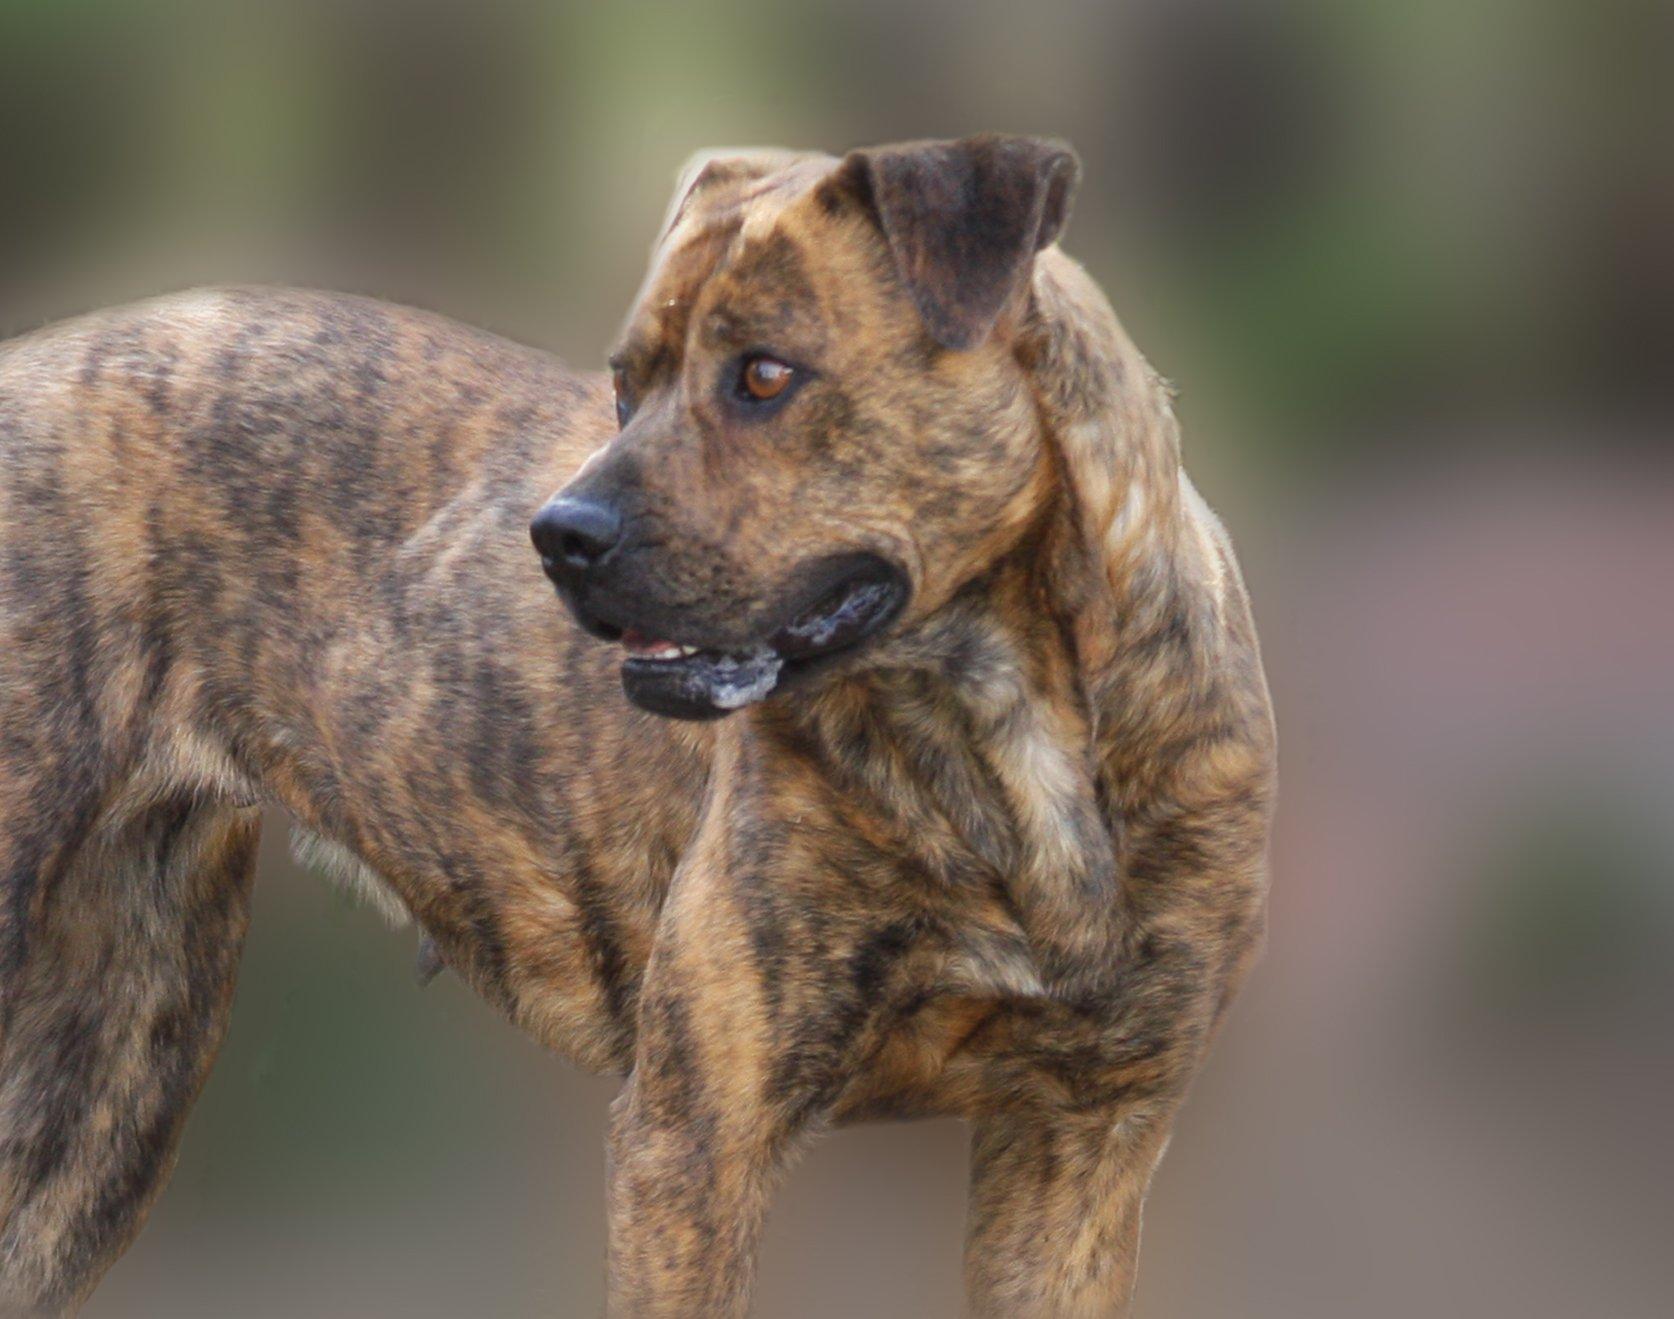 Perro perdido. | Imagen: Wikimedia Commons